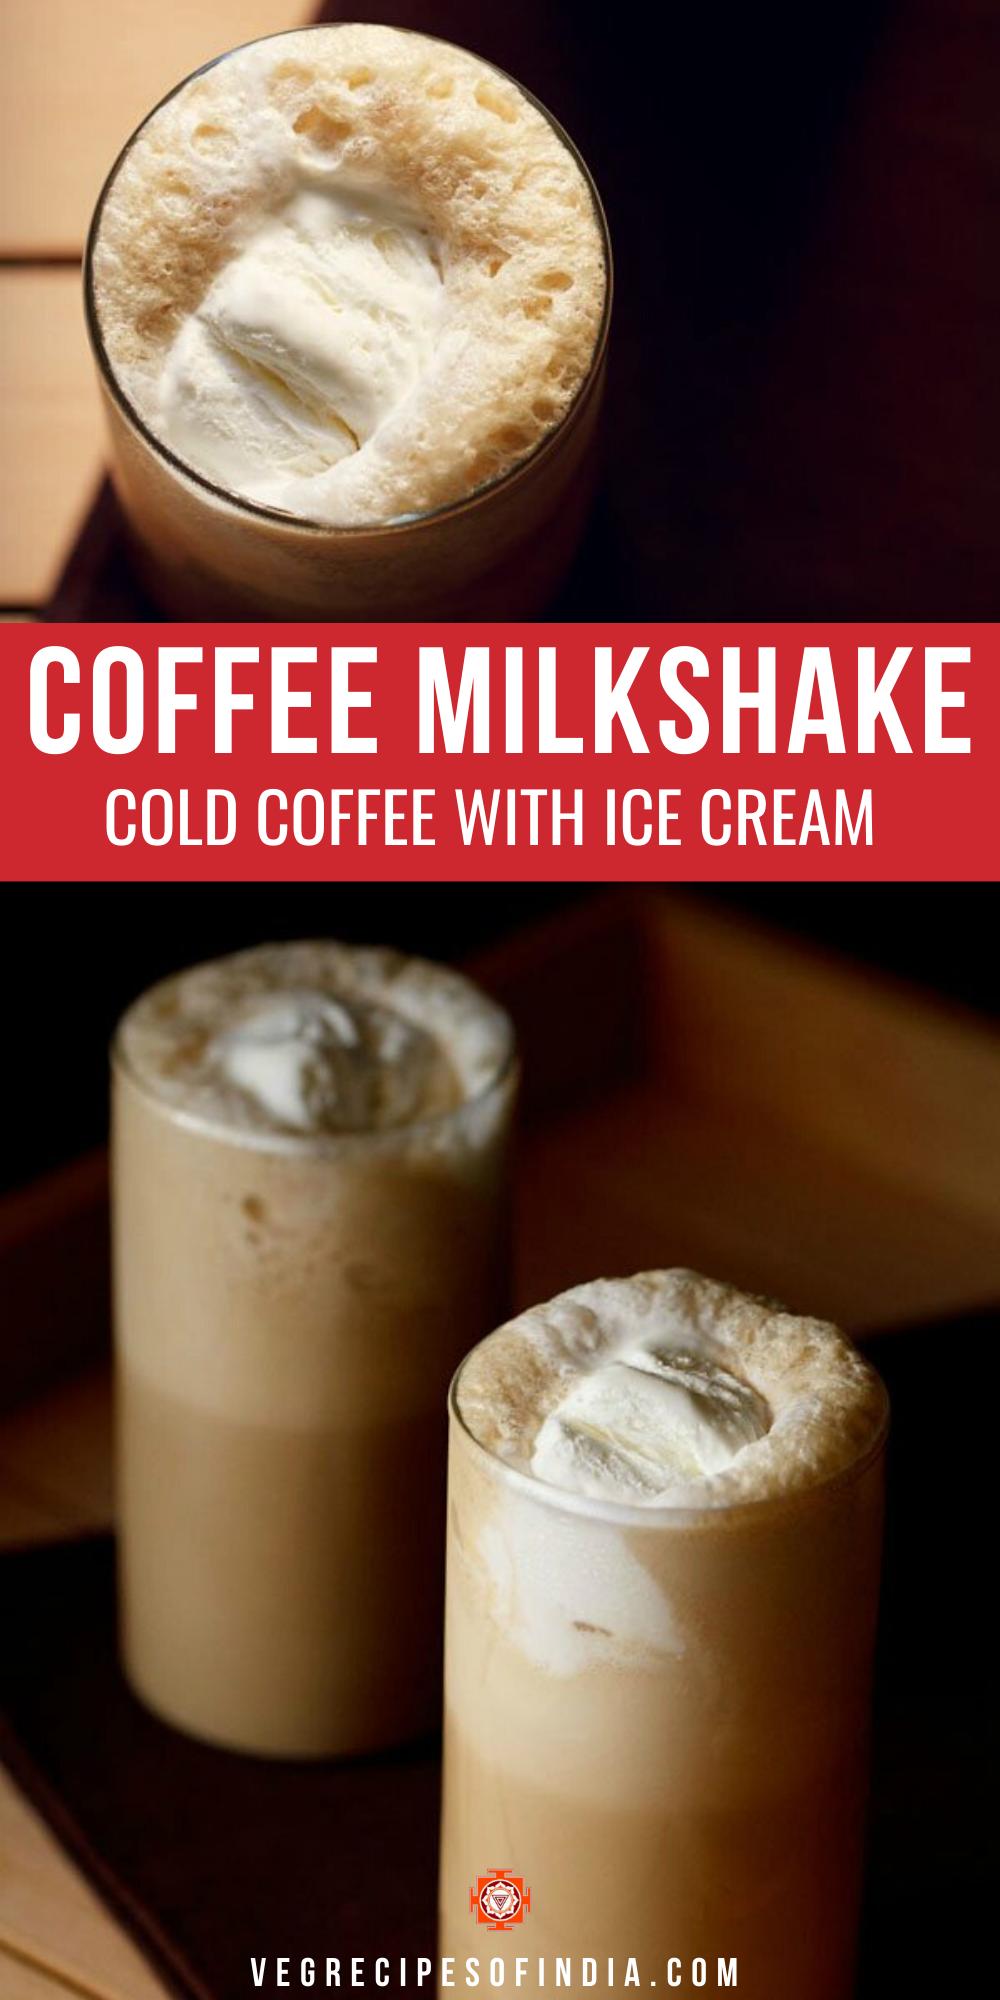 Coffee Milkshake Cold Coffee Recipes Coffee Milkshake Recipe Coffee Drink Recipes